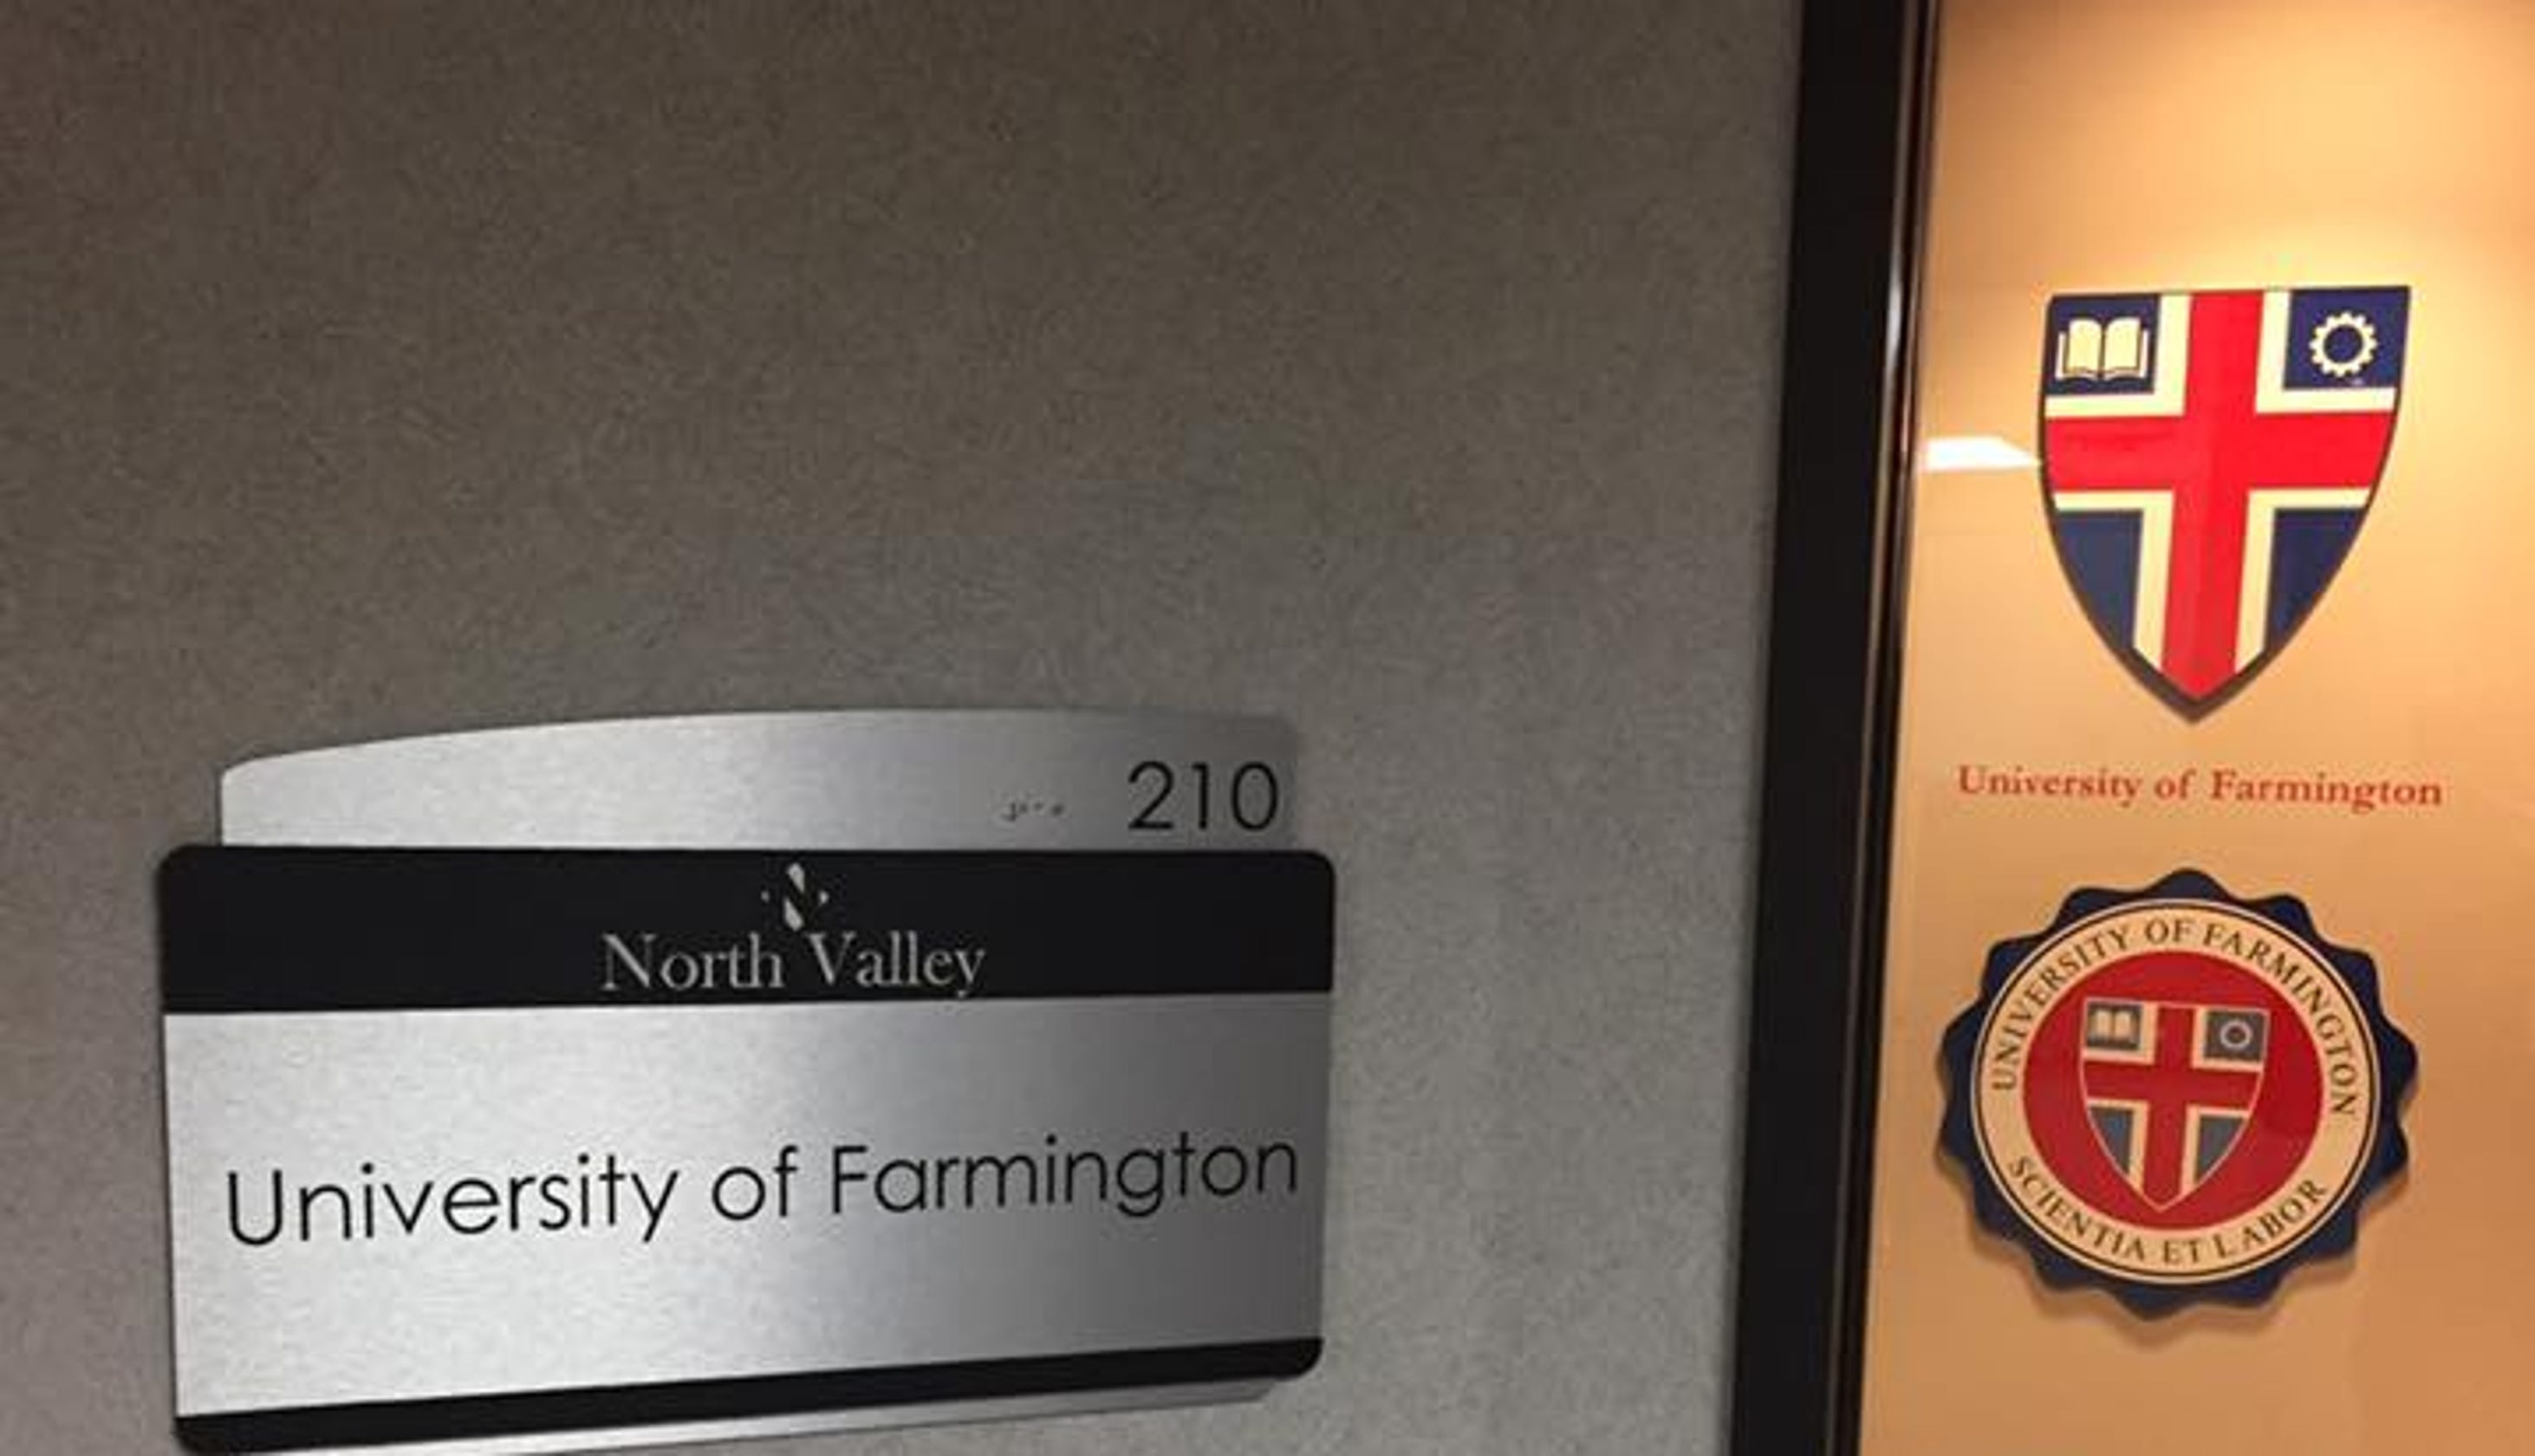 ICE arrests 130 students with fake University of Farmington